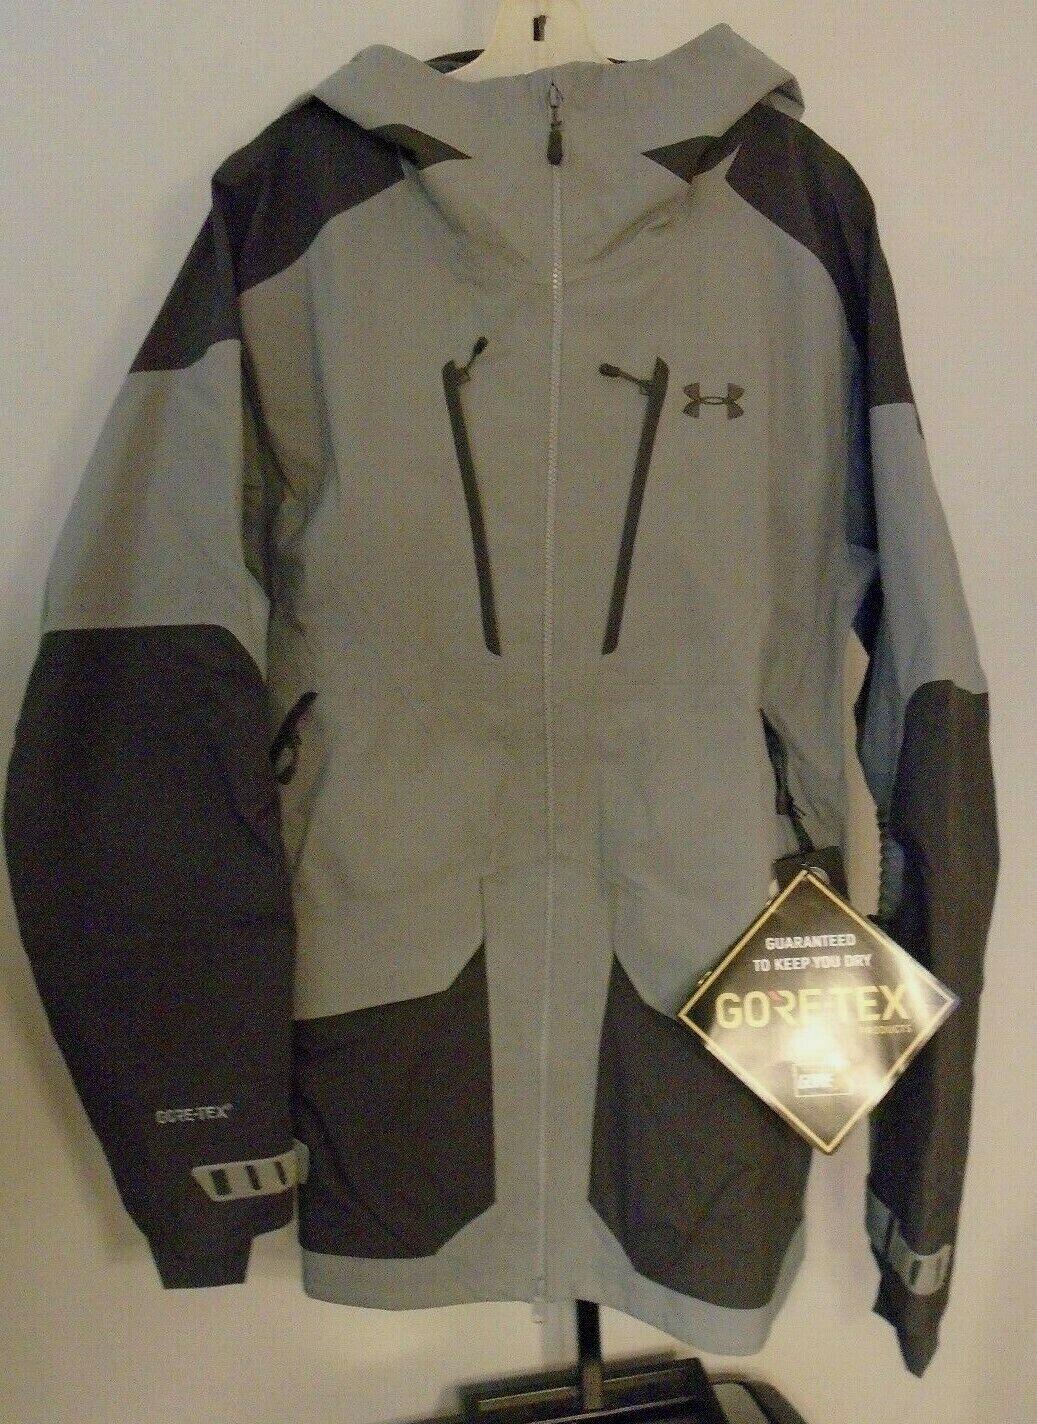 Órgano digestivo elefante bronce  Under Armour 1315977 Nimbus GTX Ski Jacket Gore-tex Men's XL Gray for sale  online   eBay